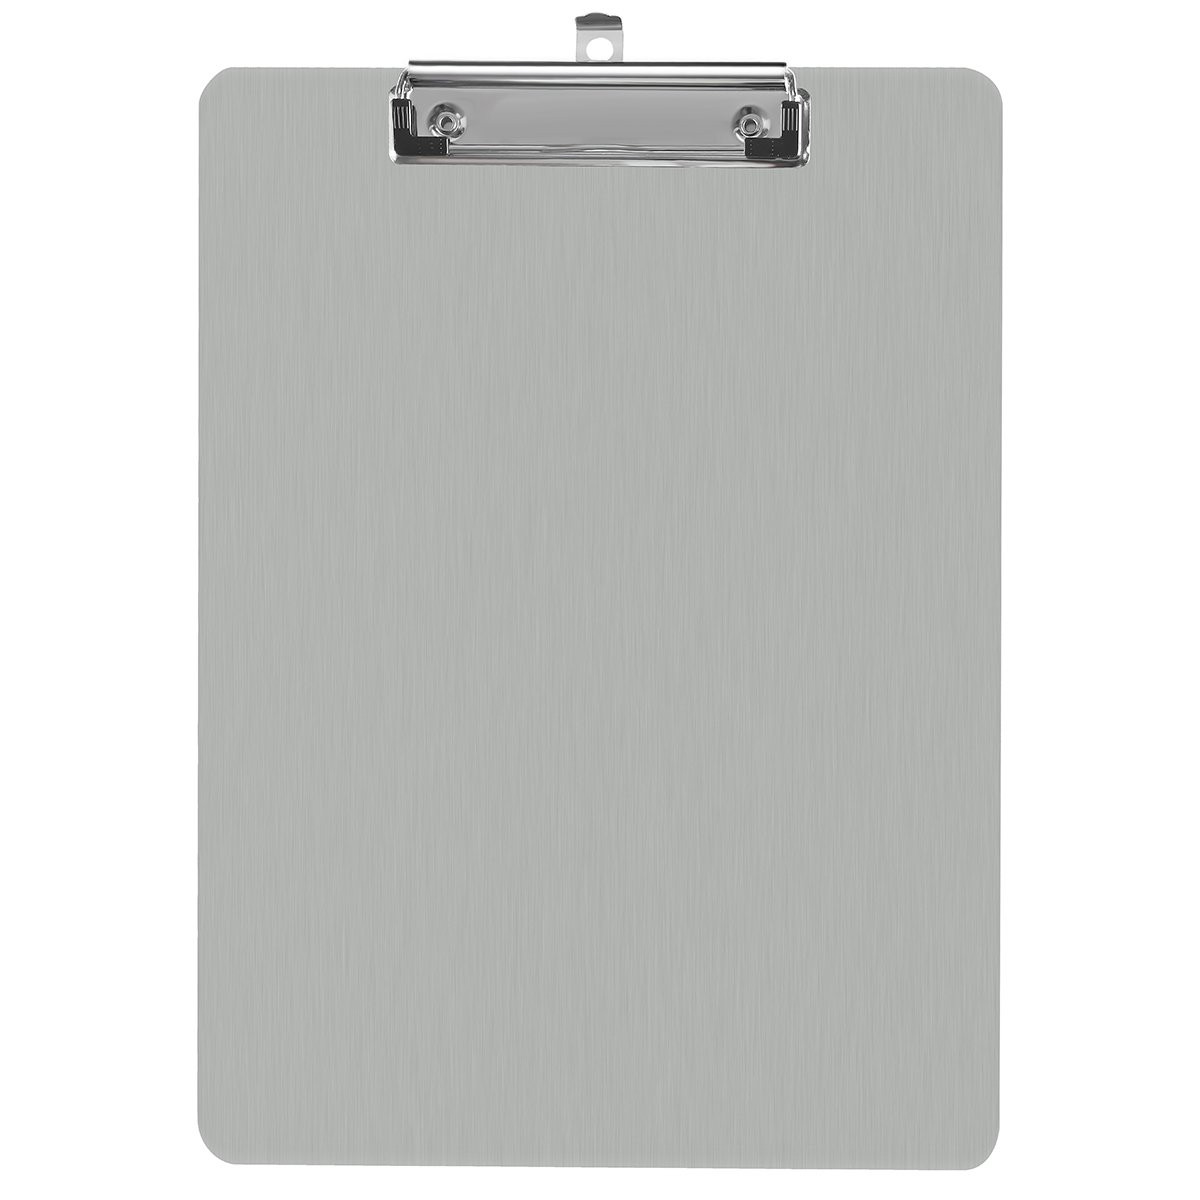 Aluminum Clipboard Paper Holder Steel Metal Clipboard - 9x12.5 Letter Size, File A4 Binder Holder for Office School Worker Business